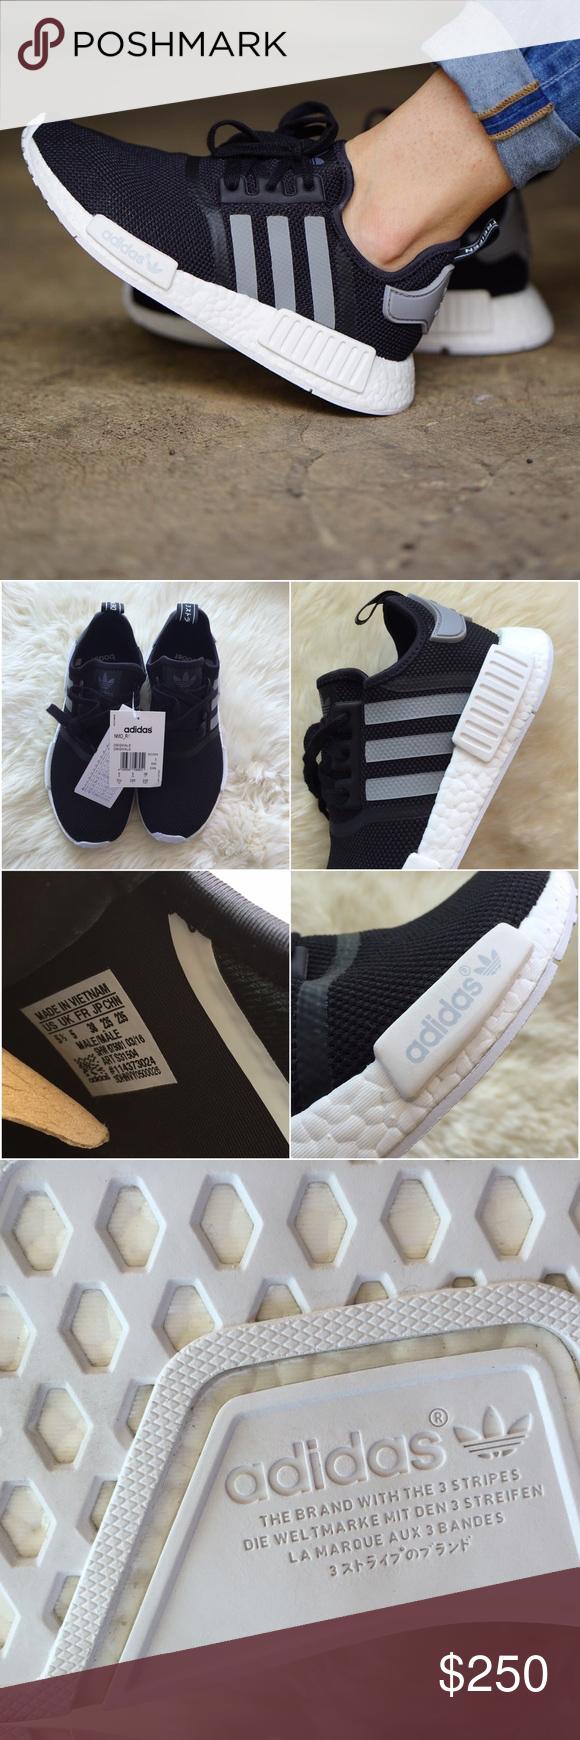 Adidas NMD R1 Black Mesh Sneakers